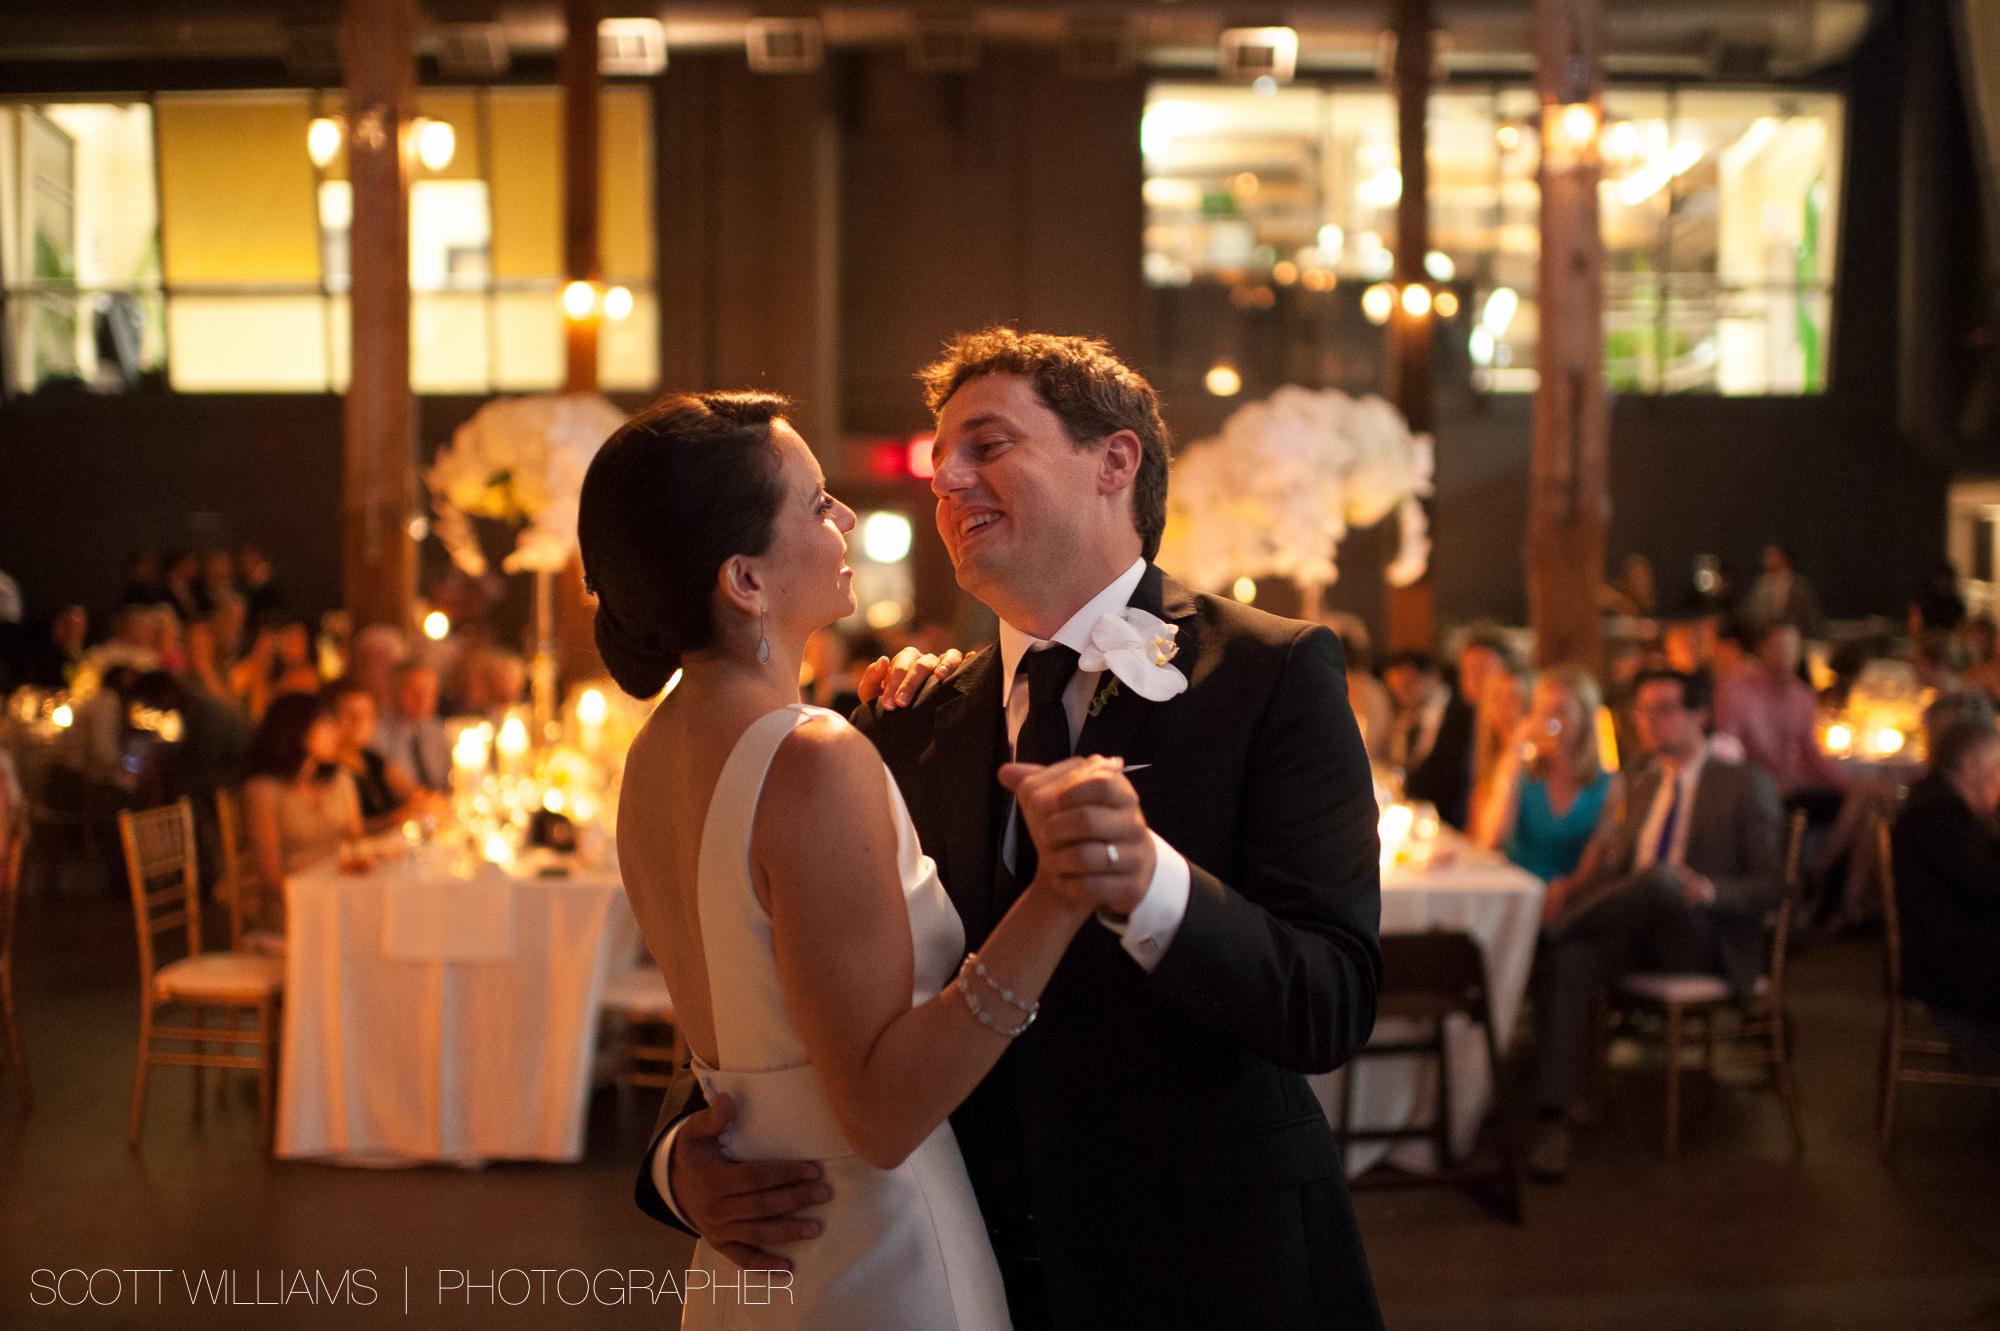 steamwhistle-brewery-wedding-toronto-012.jpg